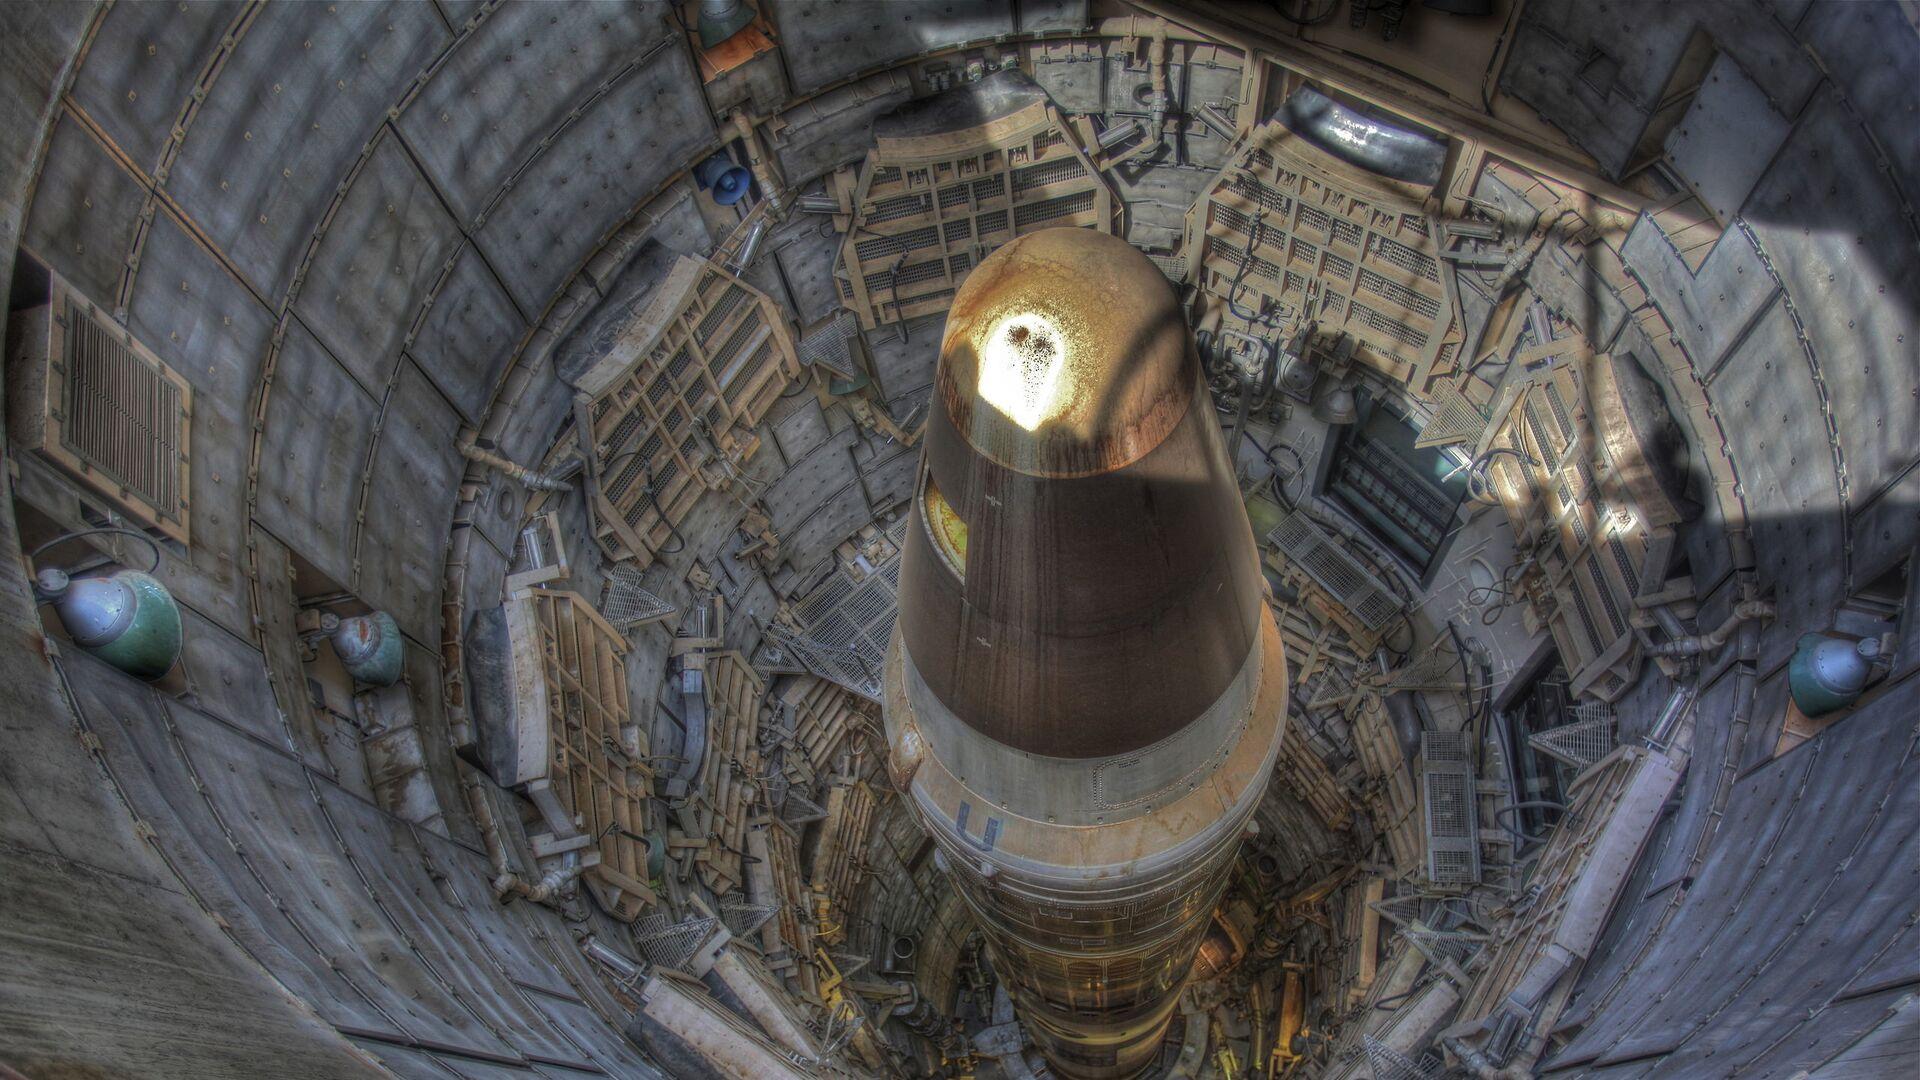 Nuklearni silos - Sputnik Srbija, 1920, 09.06.2021